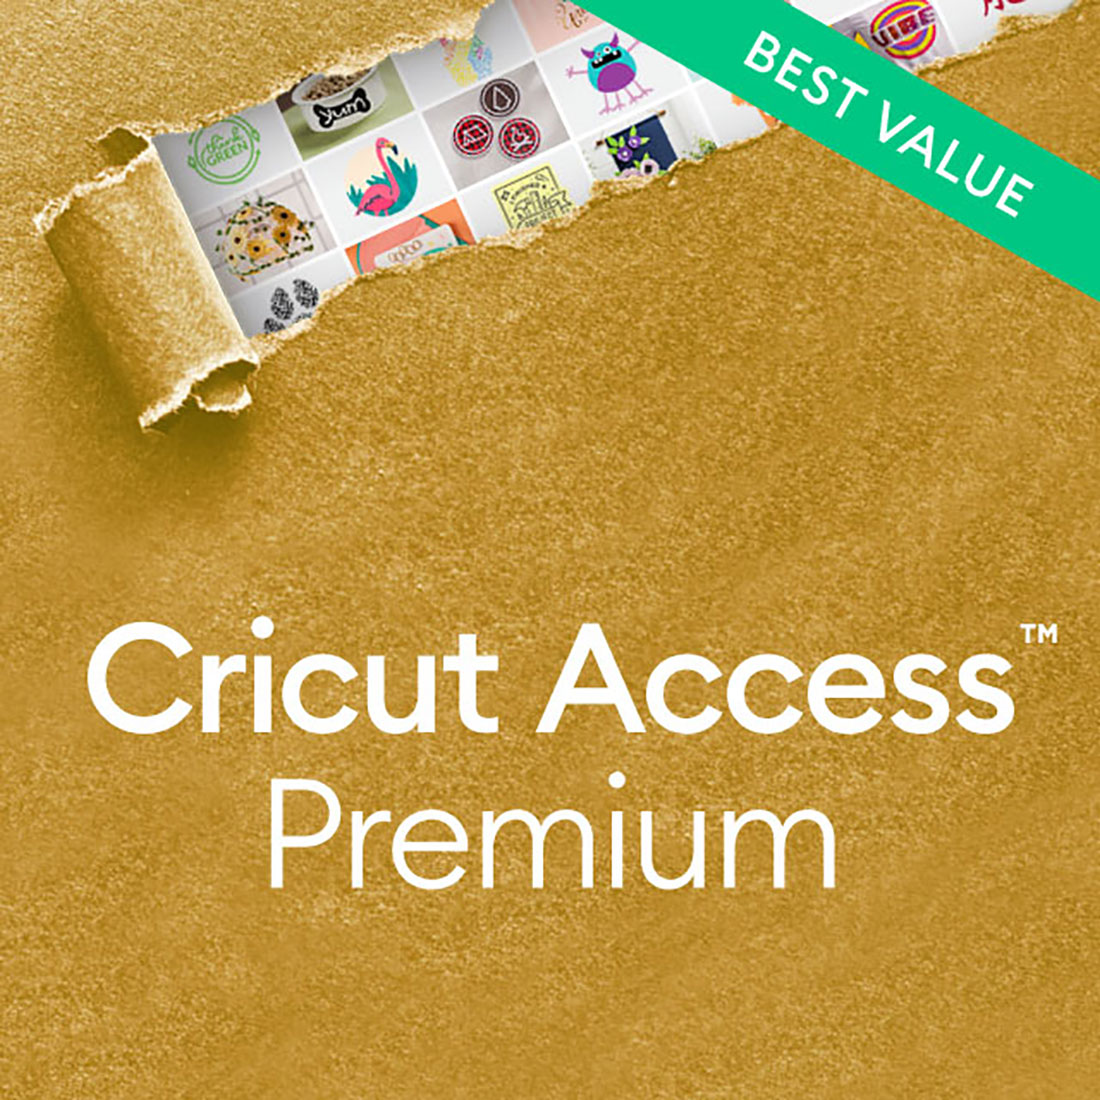 Cricut Access Premium Subscription